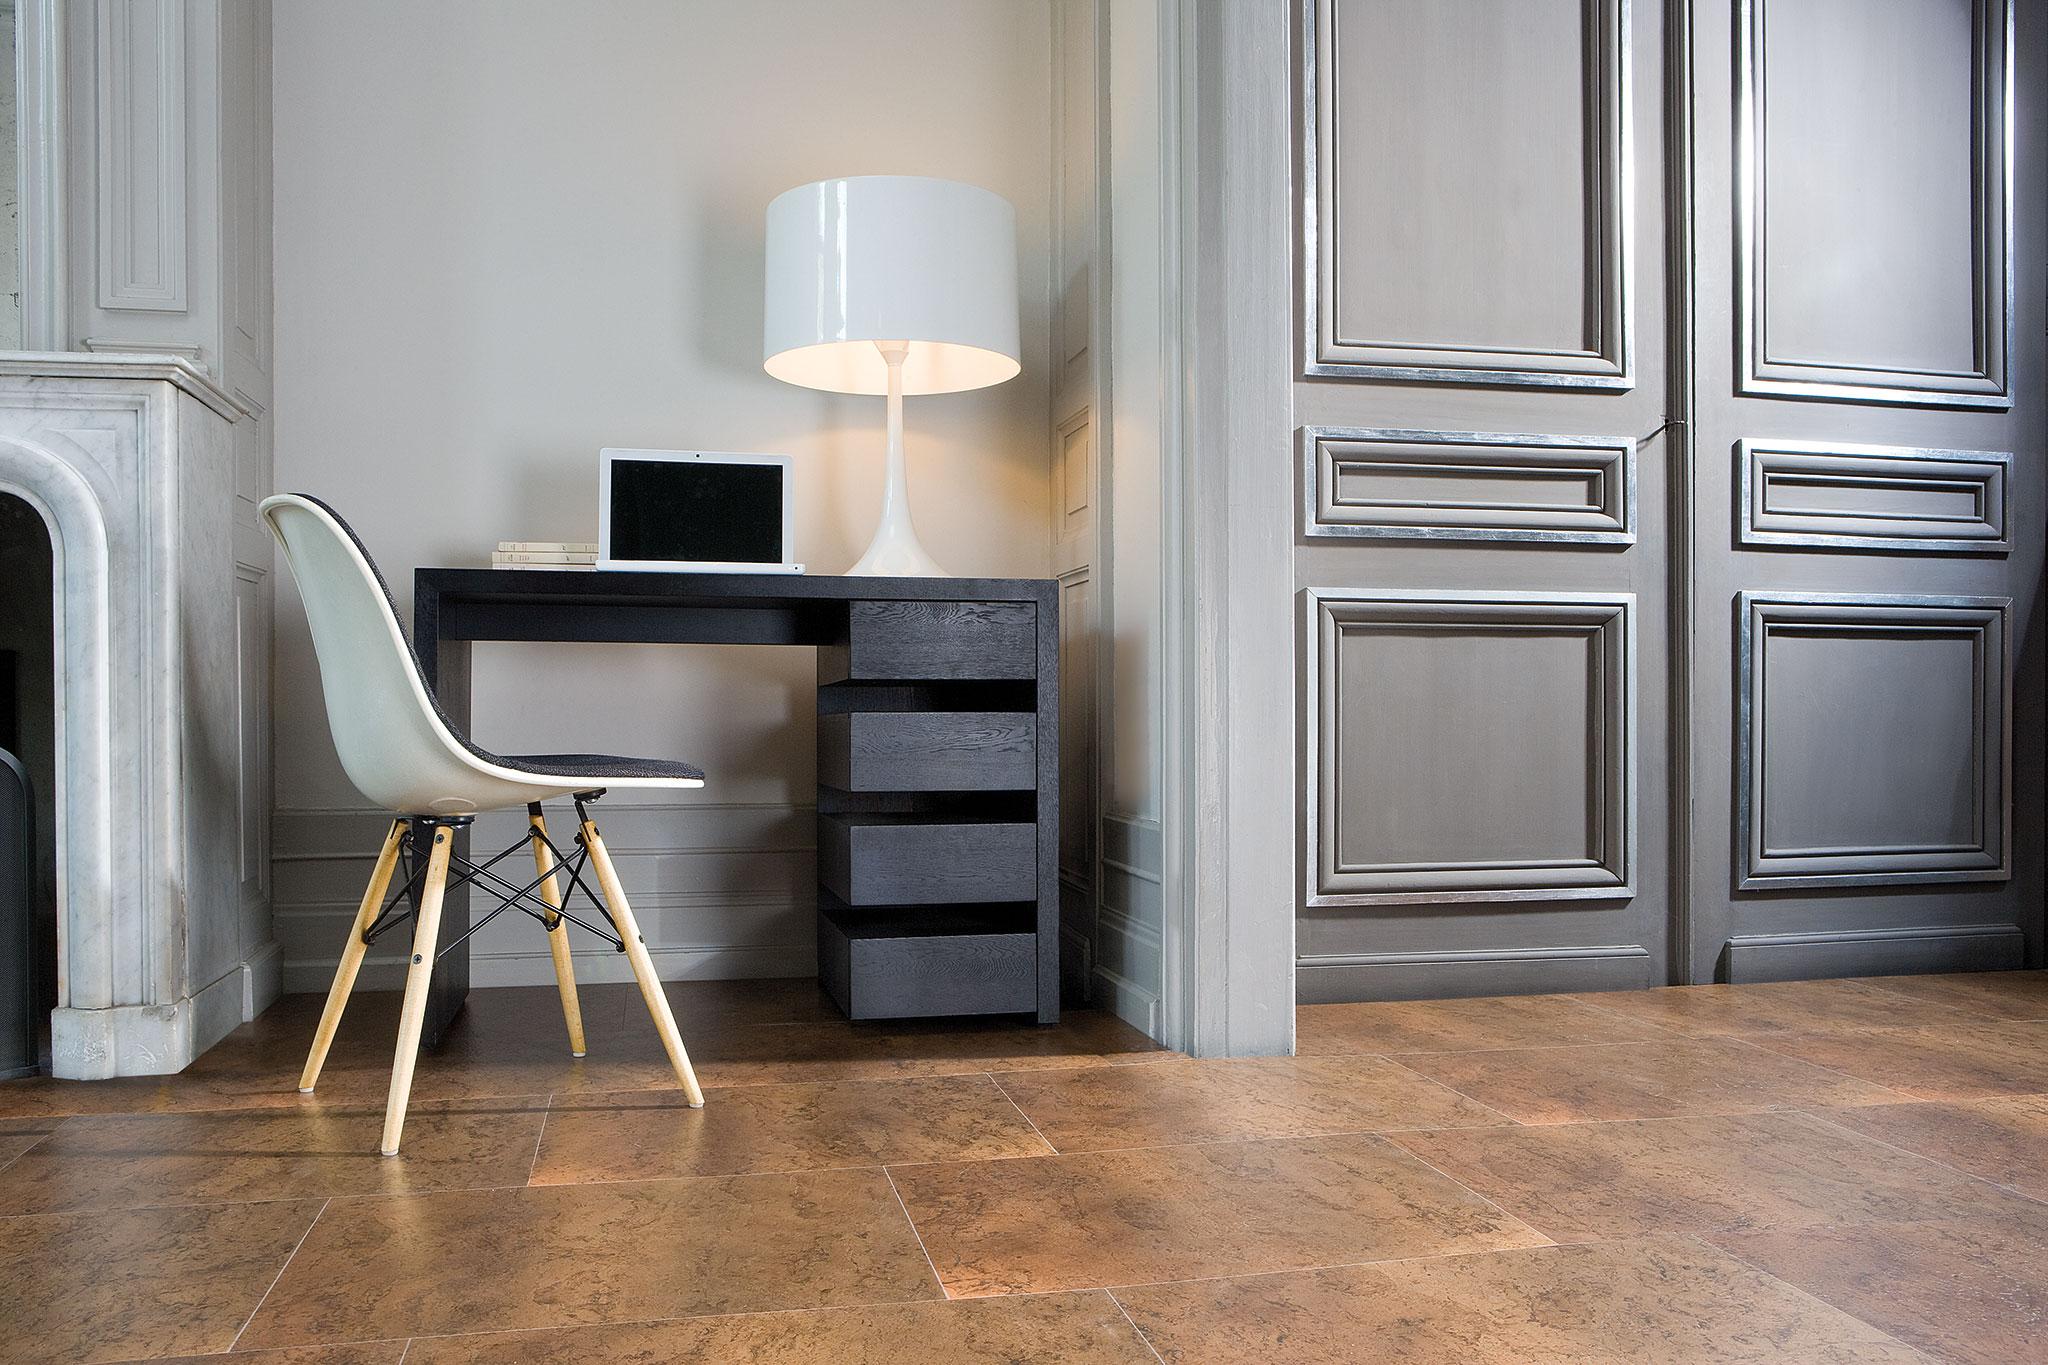 Real Cork Floors - Cork Flooring Companies